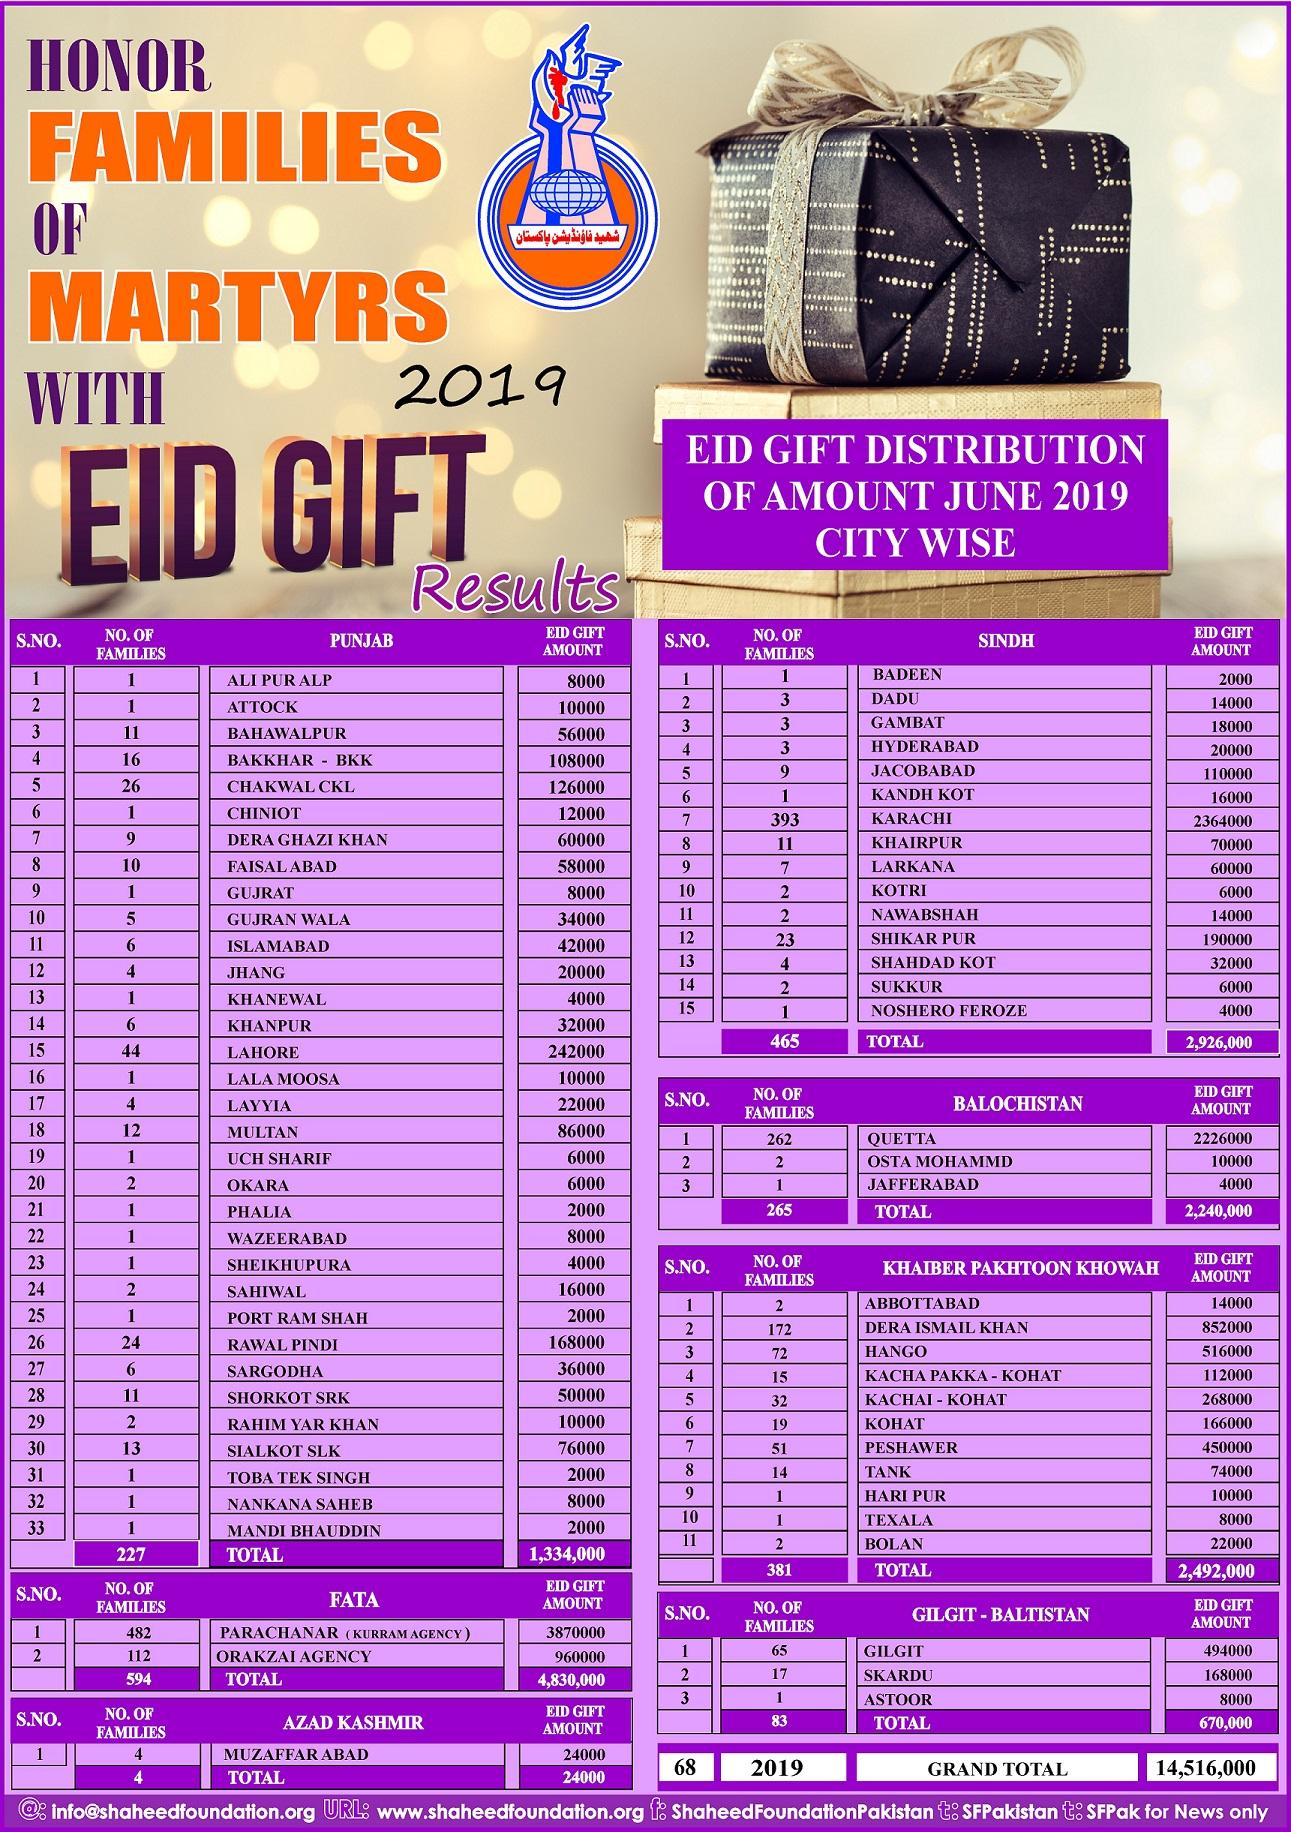 Eid-ul-Fitr Gift Project 2019: Disbursement Details